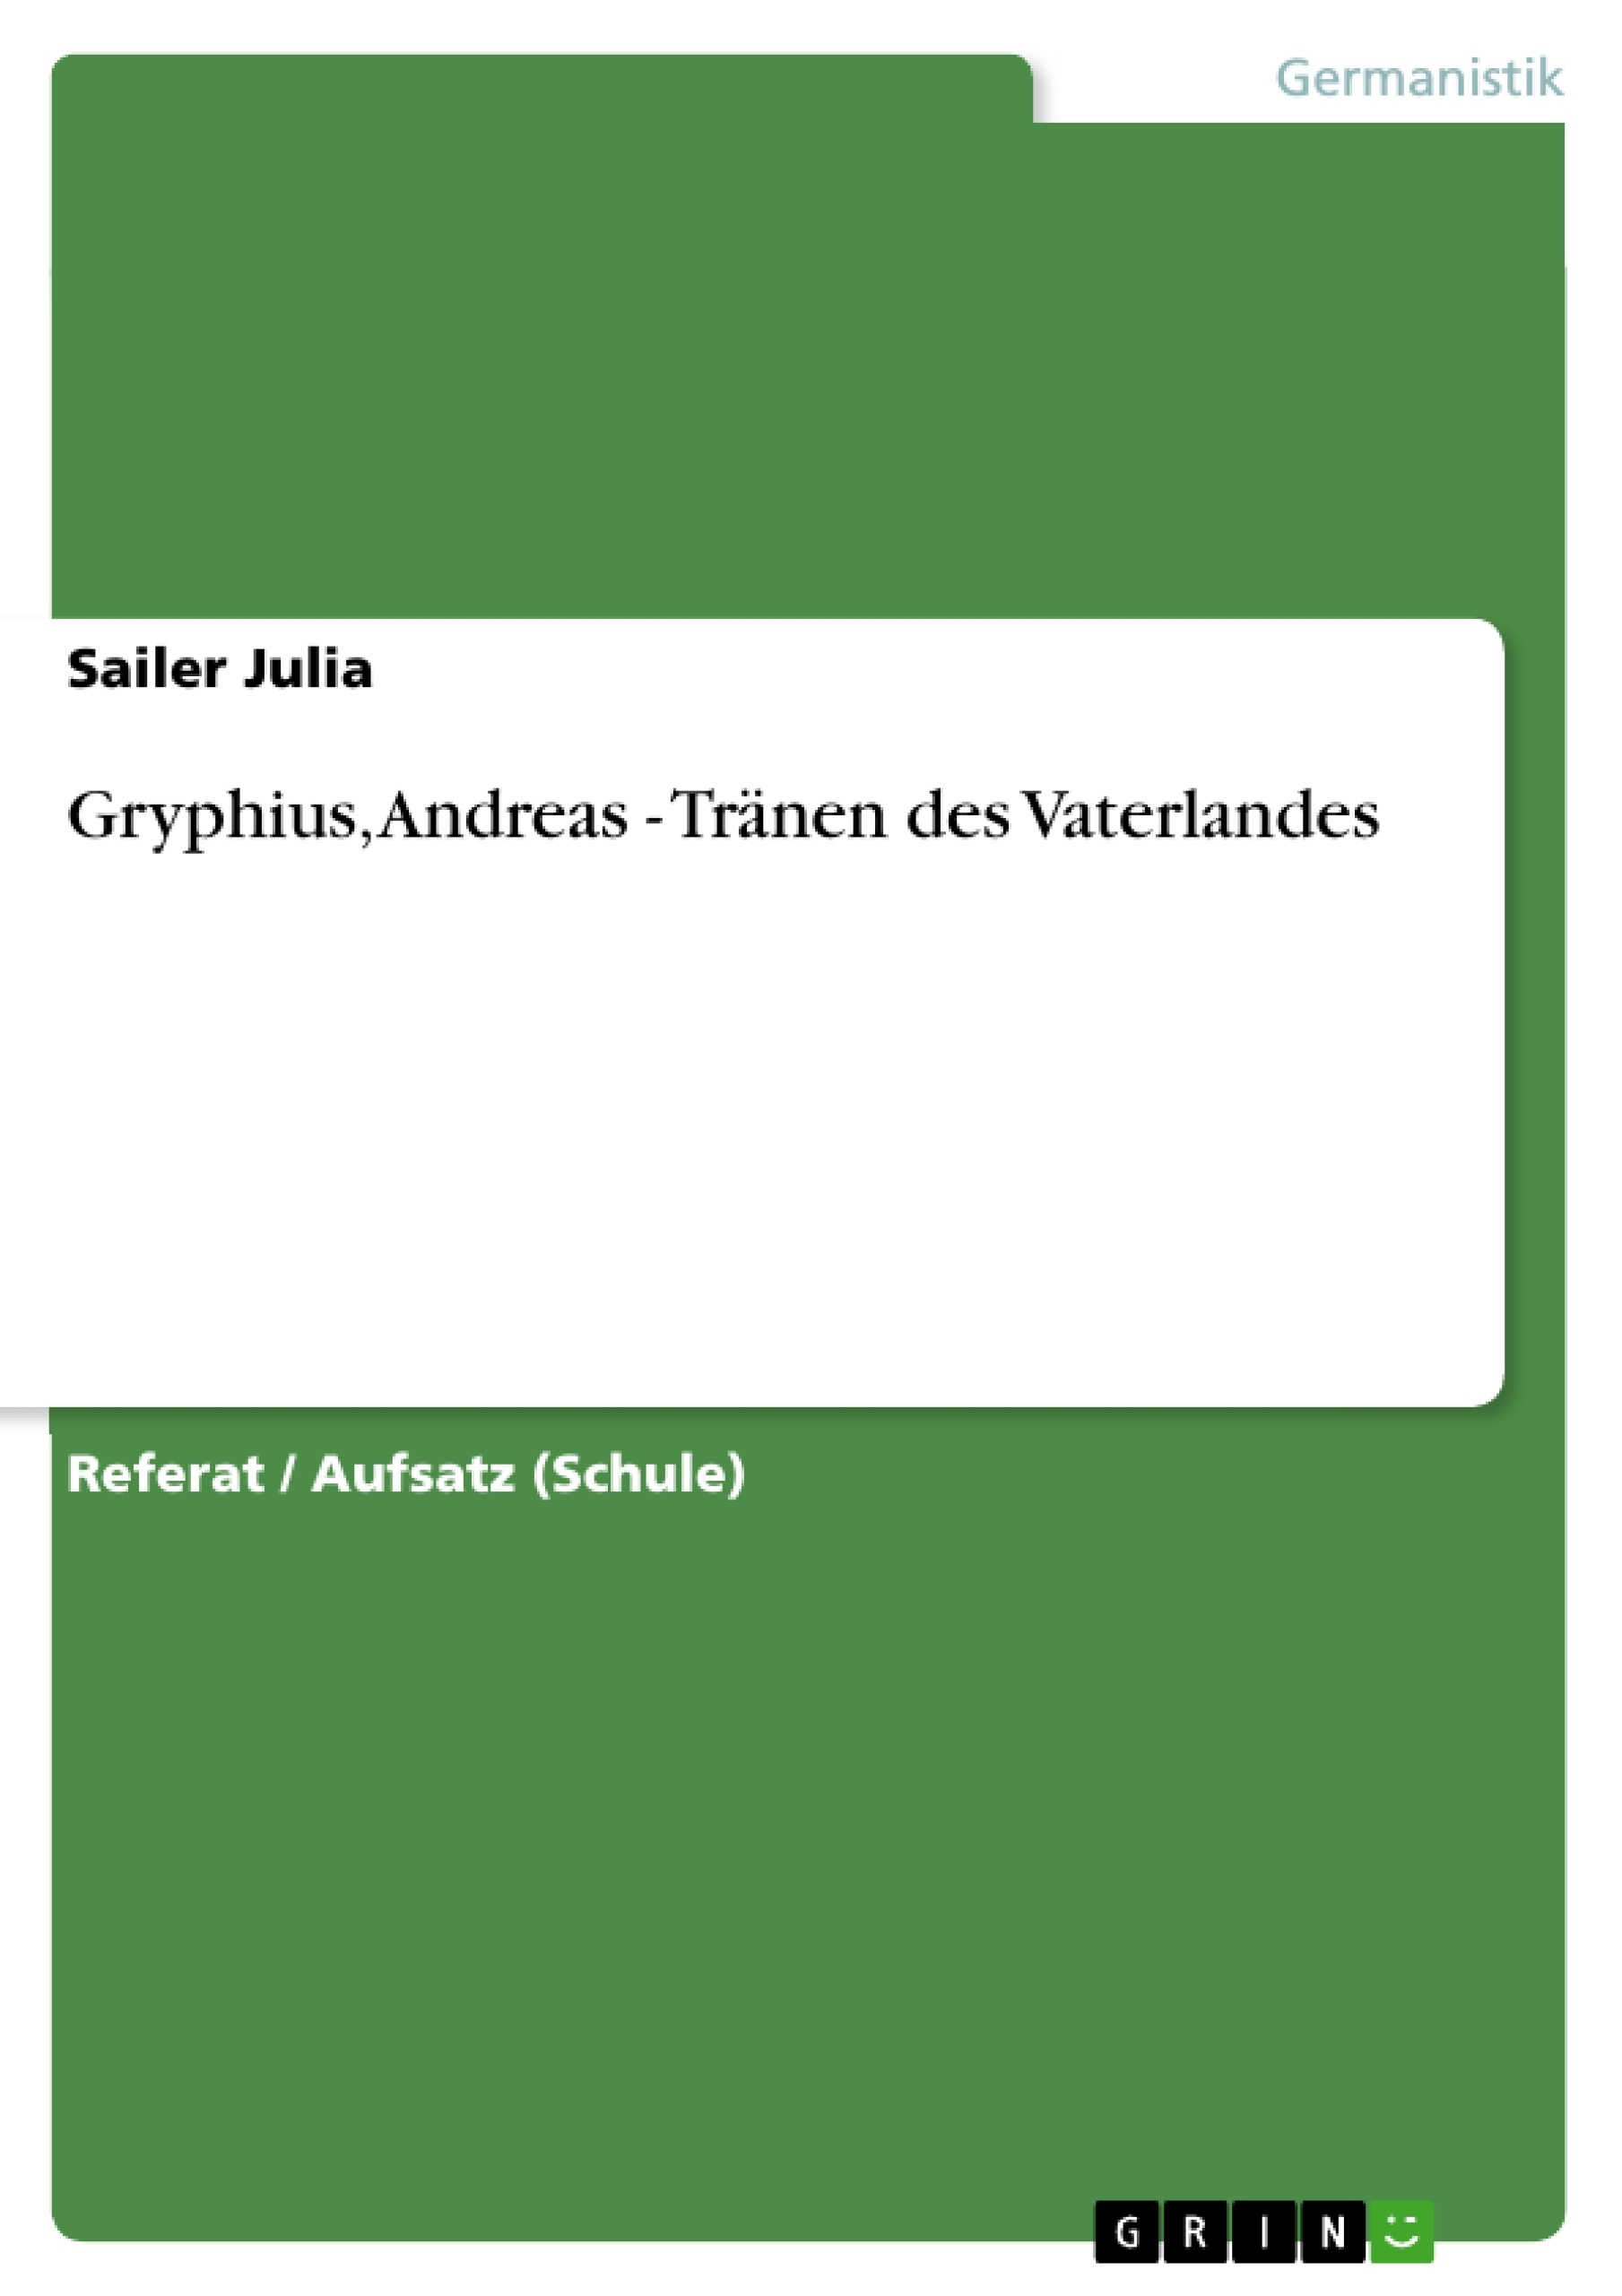 Titel: Gryphius, Andreas - Tränen des Vaterlandes